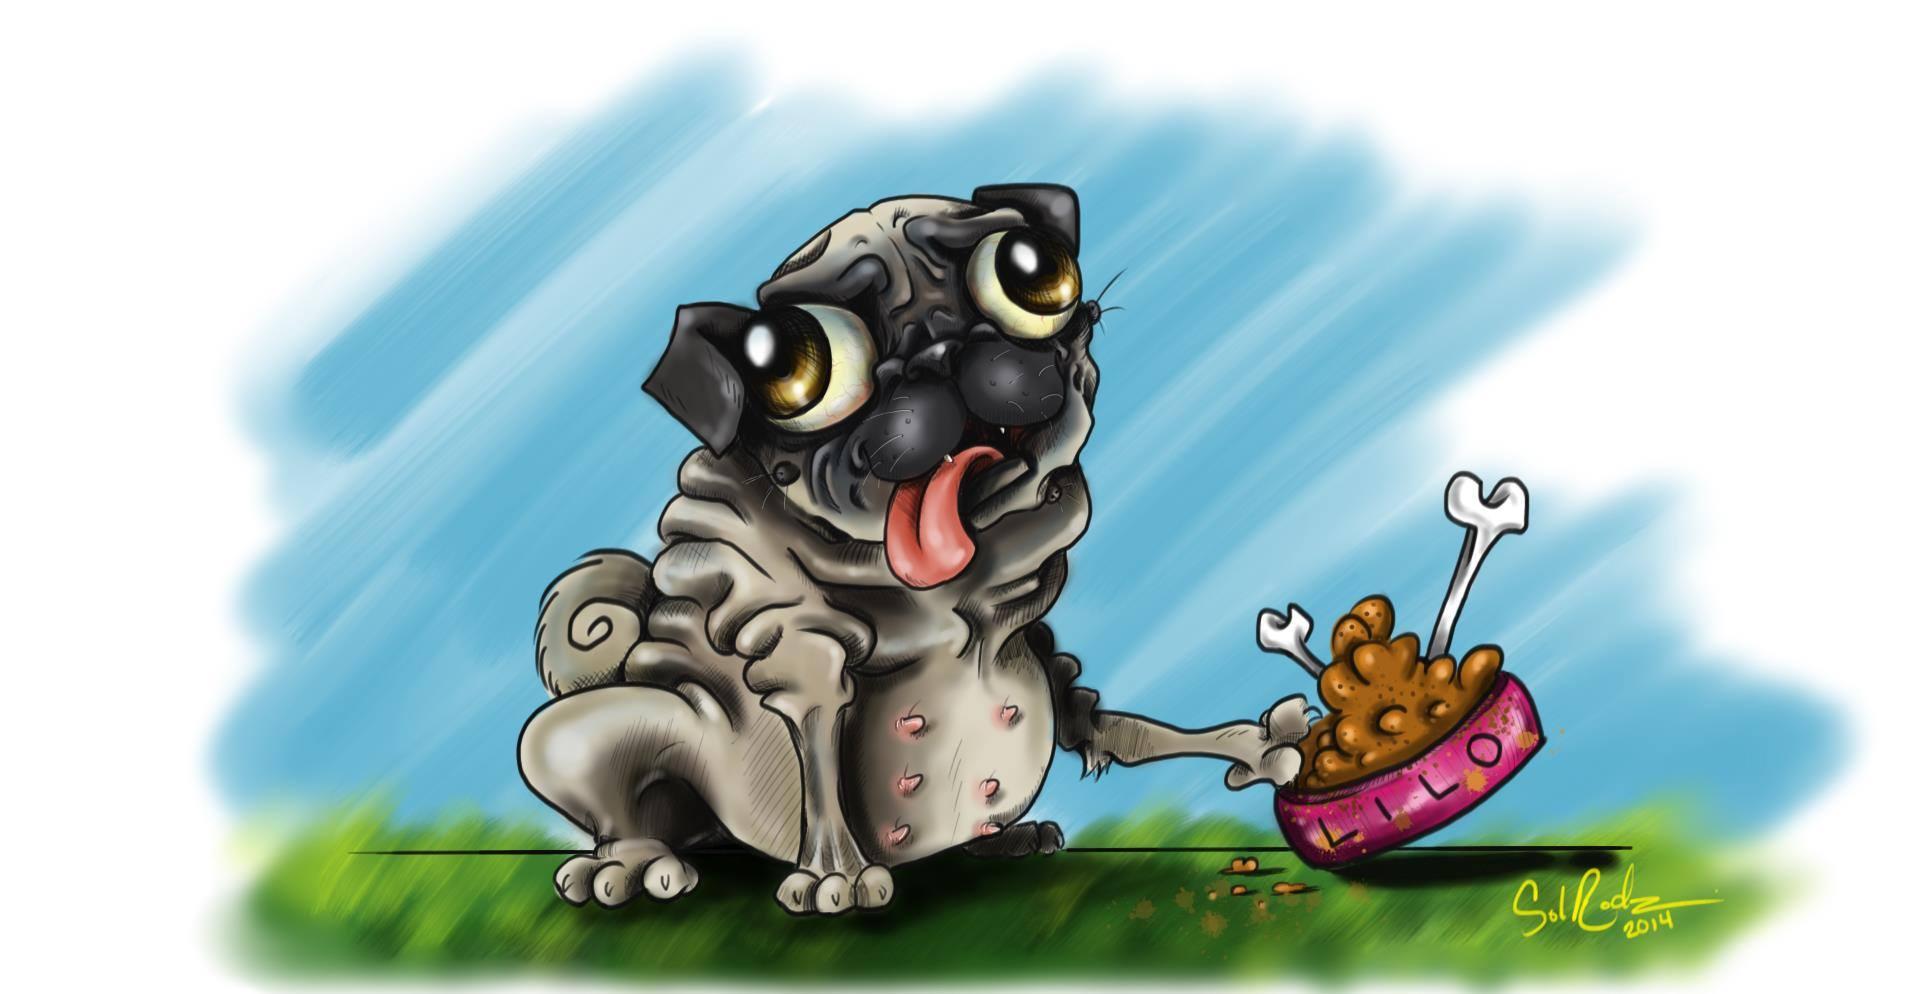 Lilo the Pug